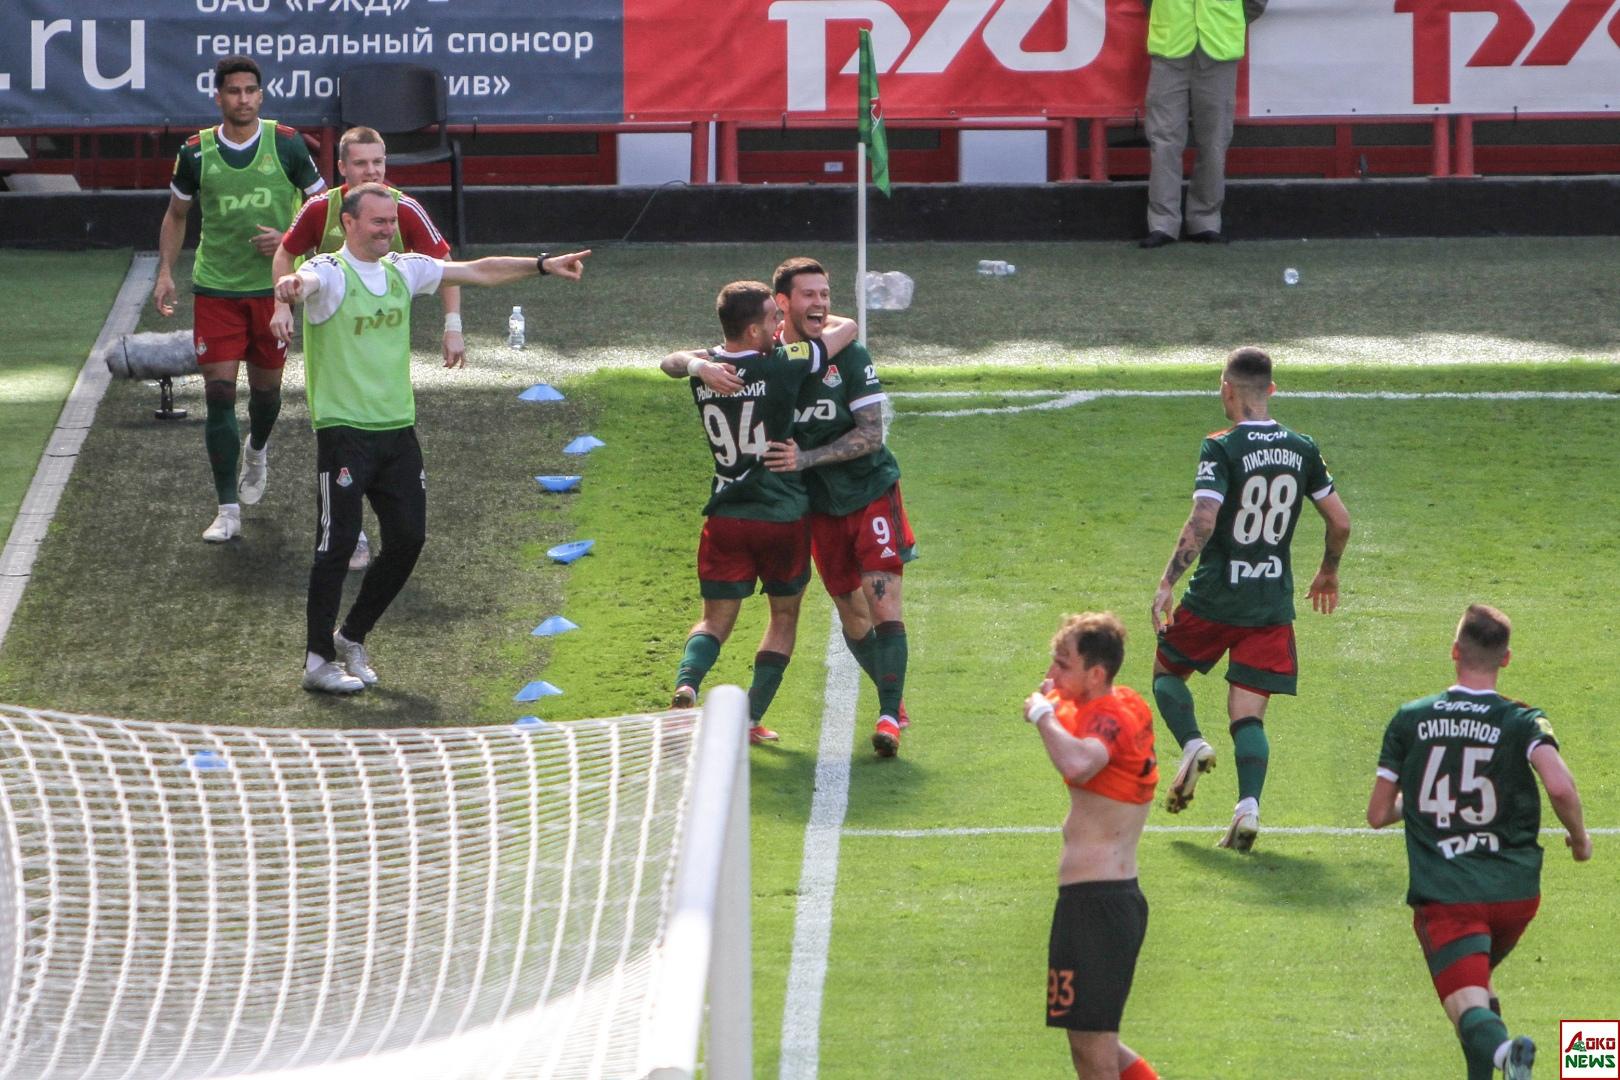 Локомотив - Урал. Фото: Дмитрий Бурдонов / Loko.News